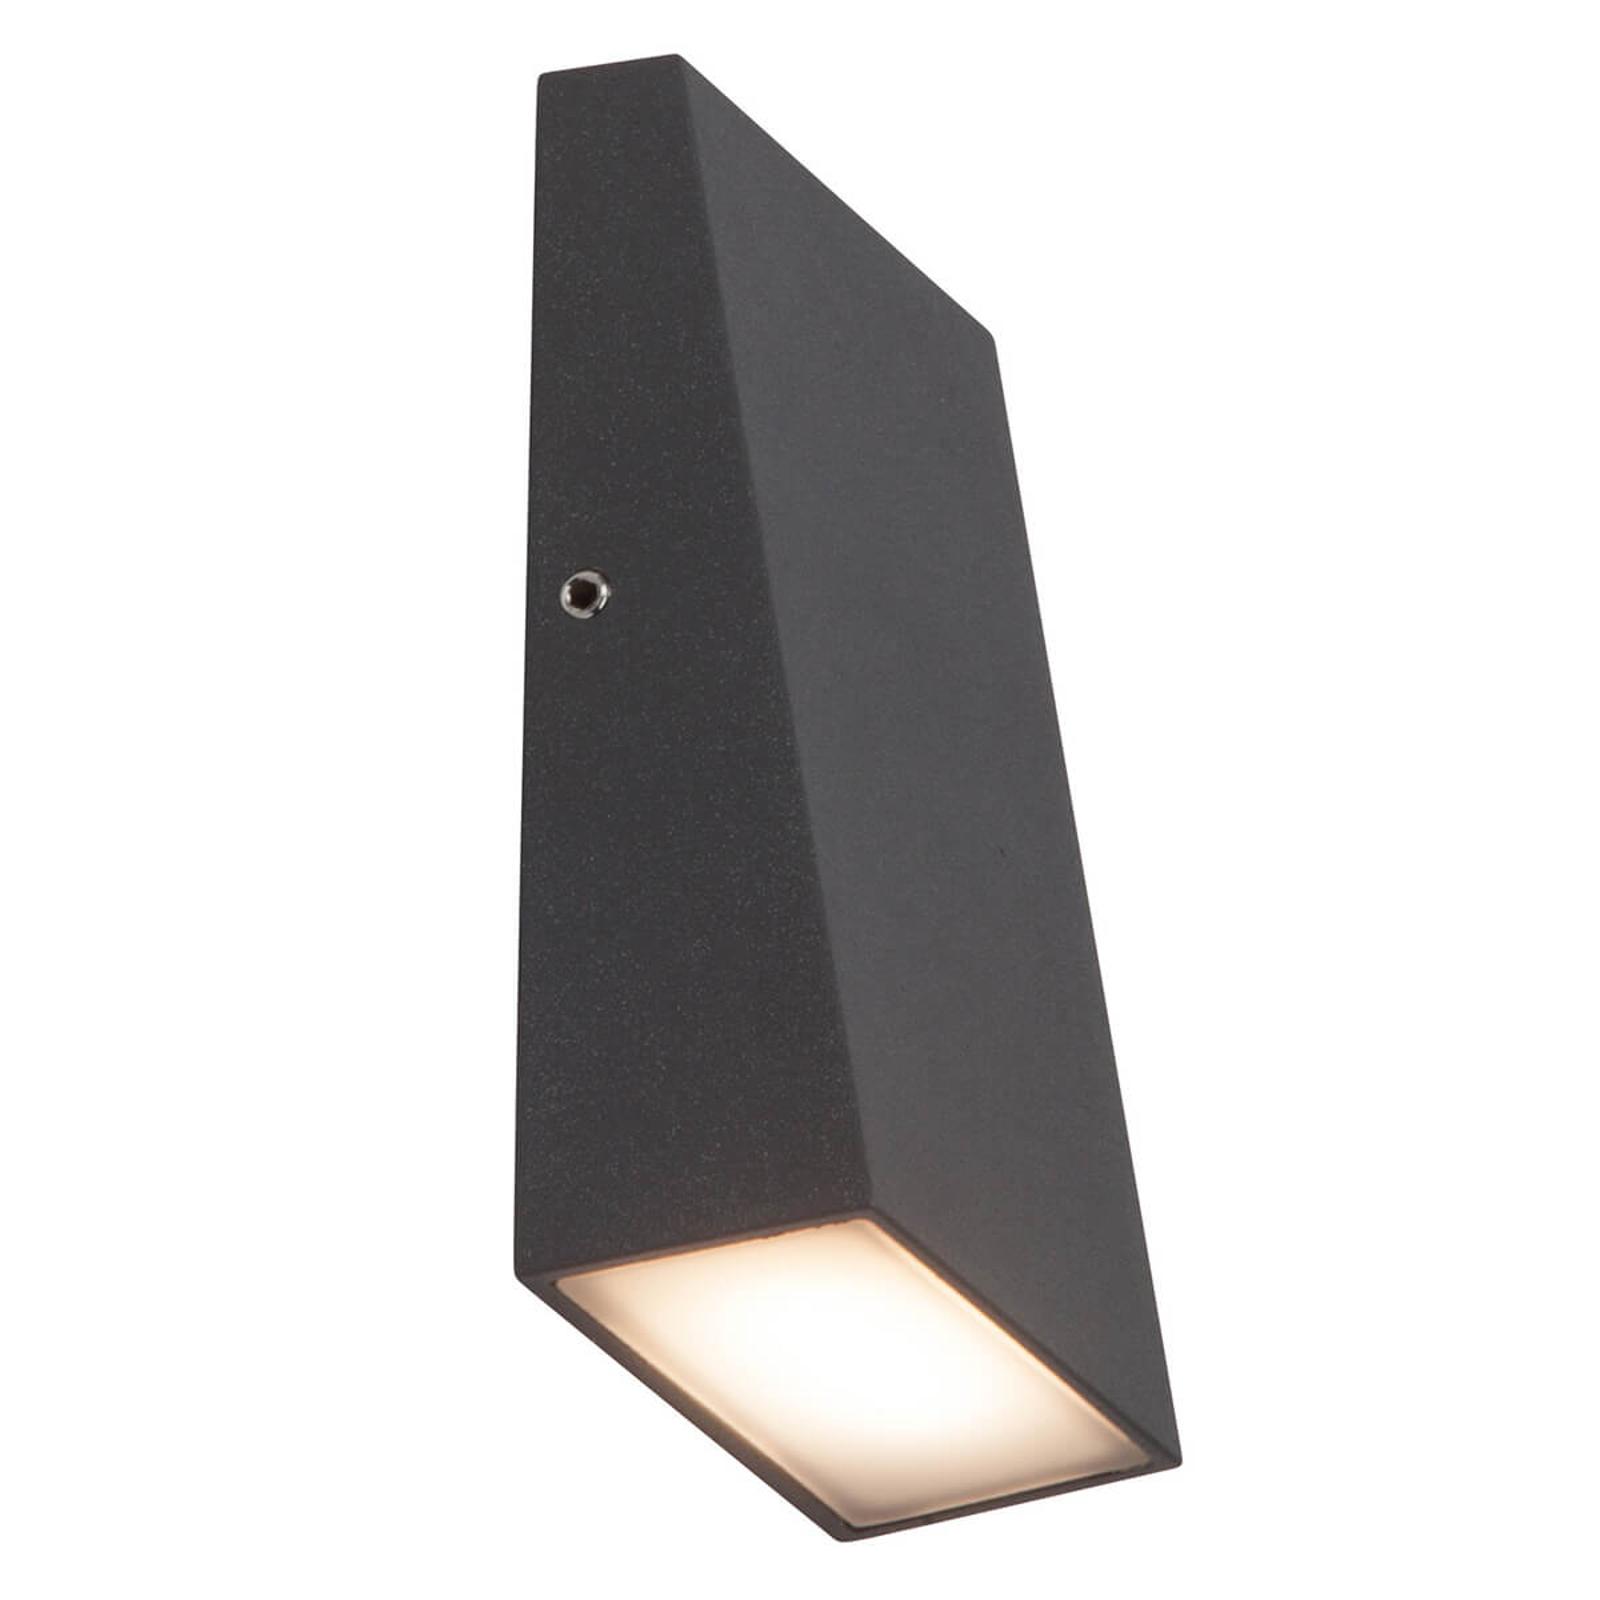 AEG Tivana - LED-Außenwandlampe, Nano-Beschichtung